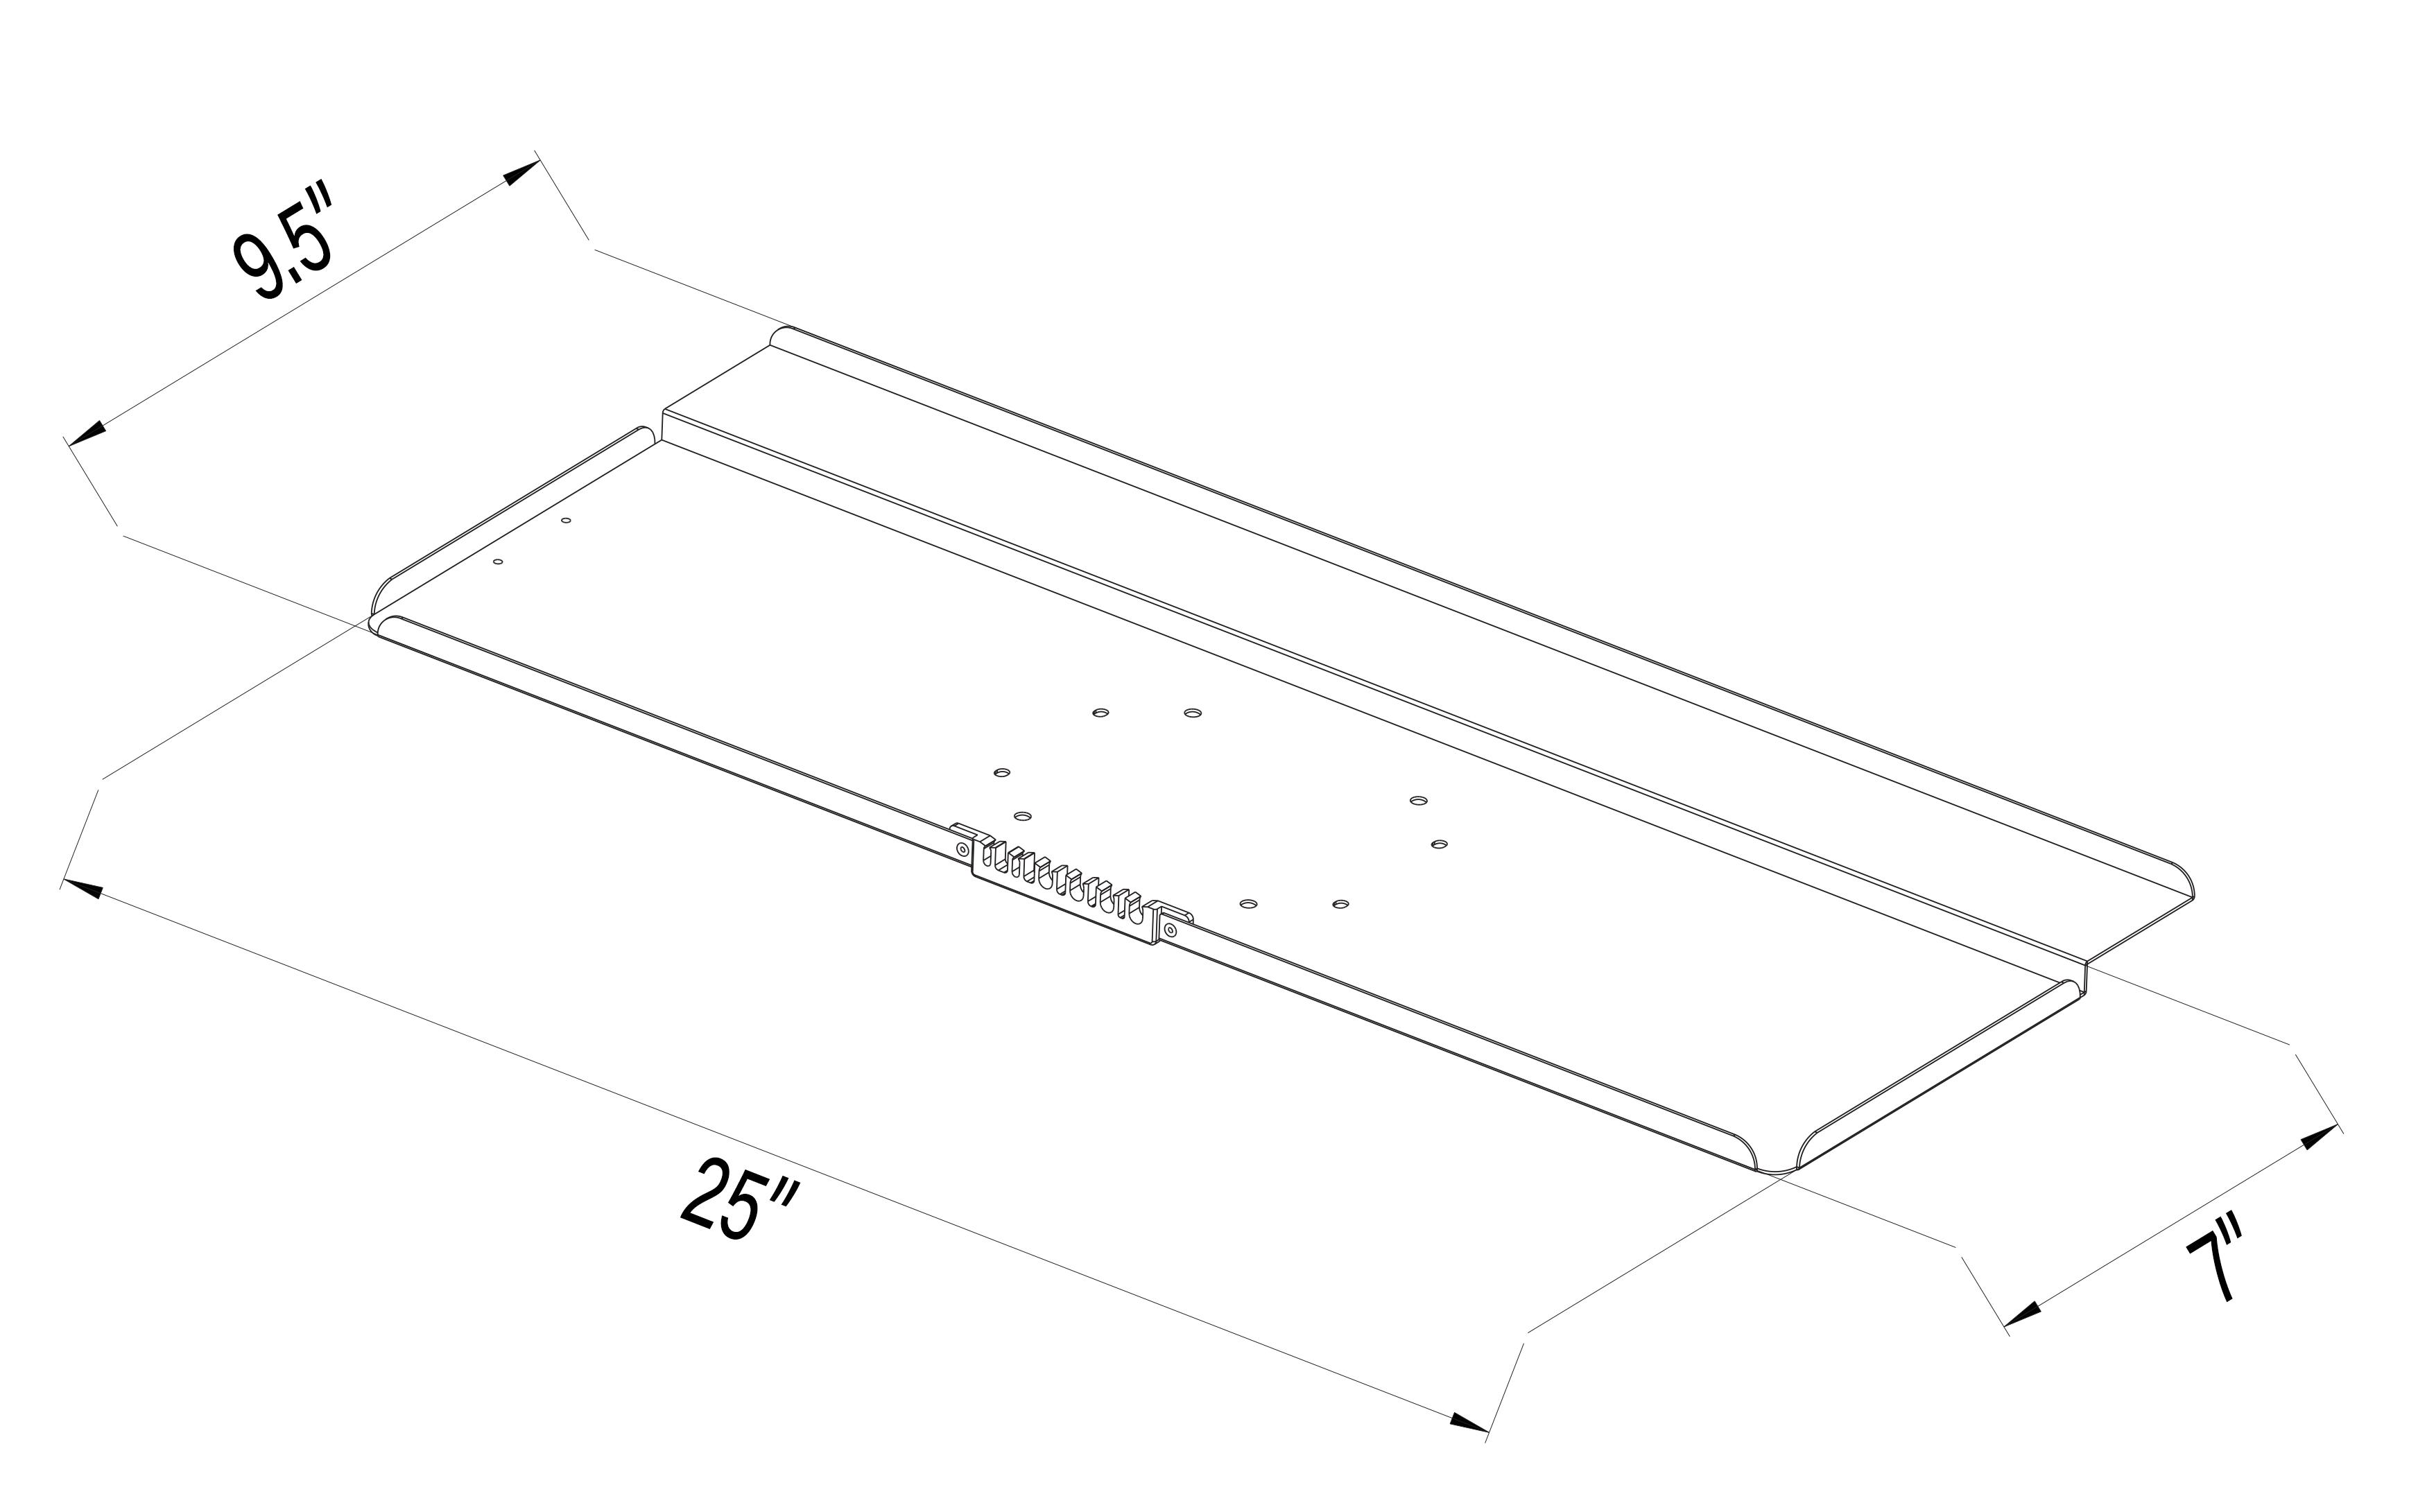 vivo deluxe computer keyboard tray holder for vesa mount stand    fits vesa 100mm